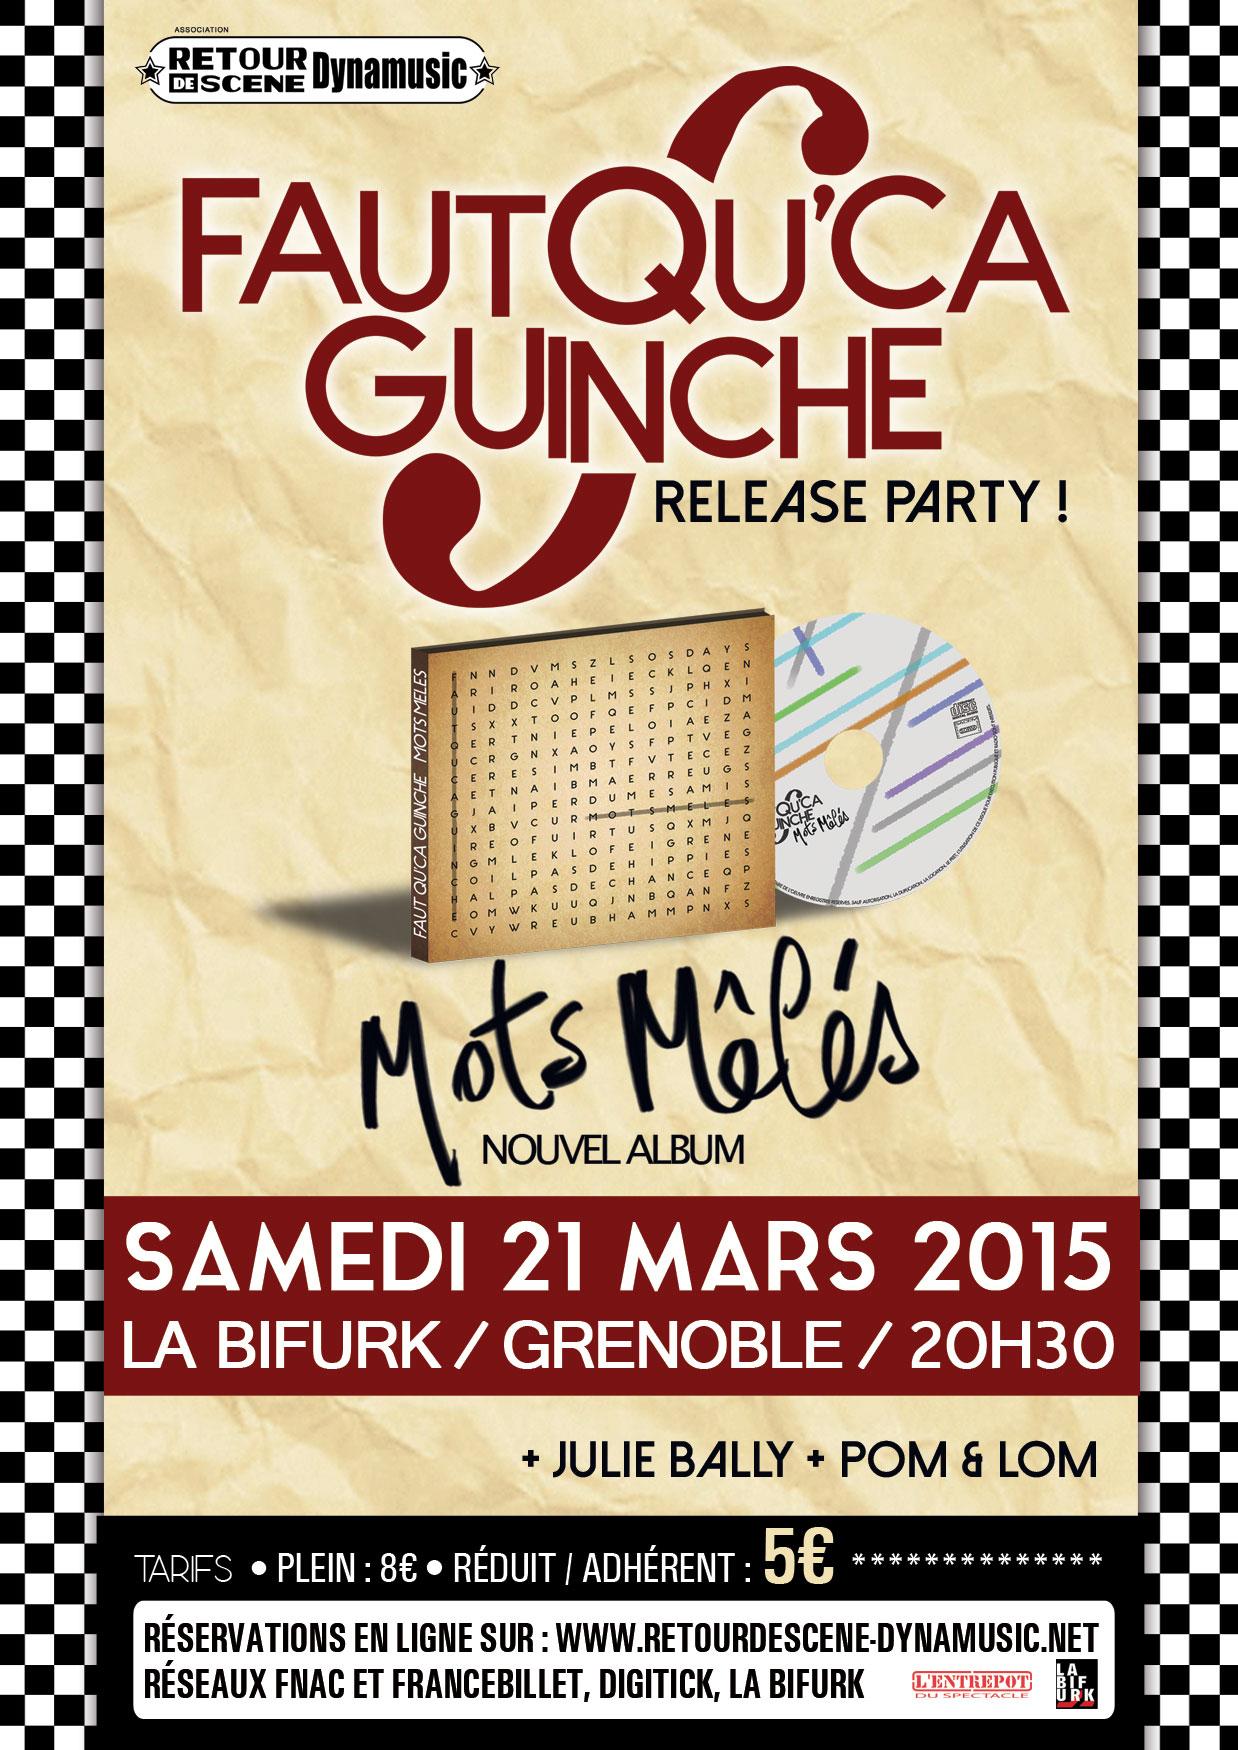 Faut Qu'ça Guinche - La Birfurk - 21/03/2015